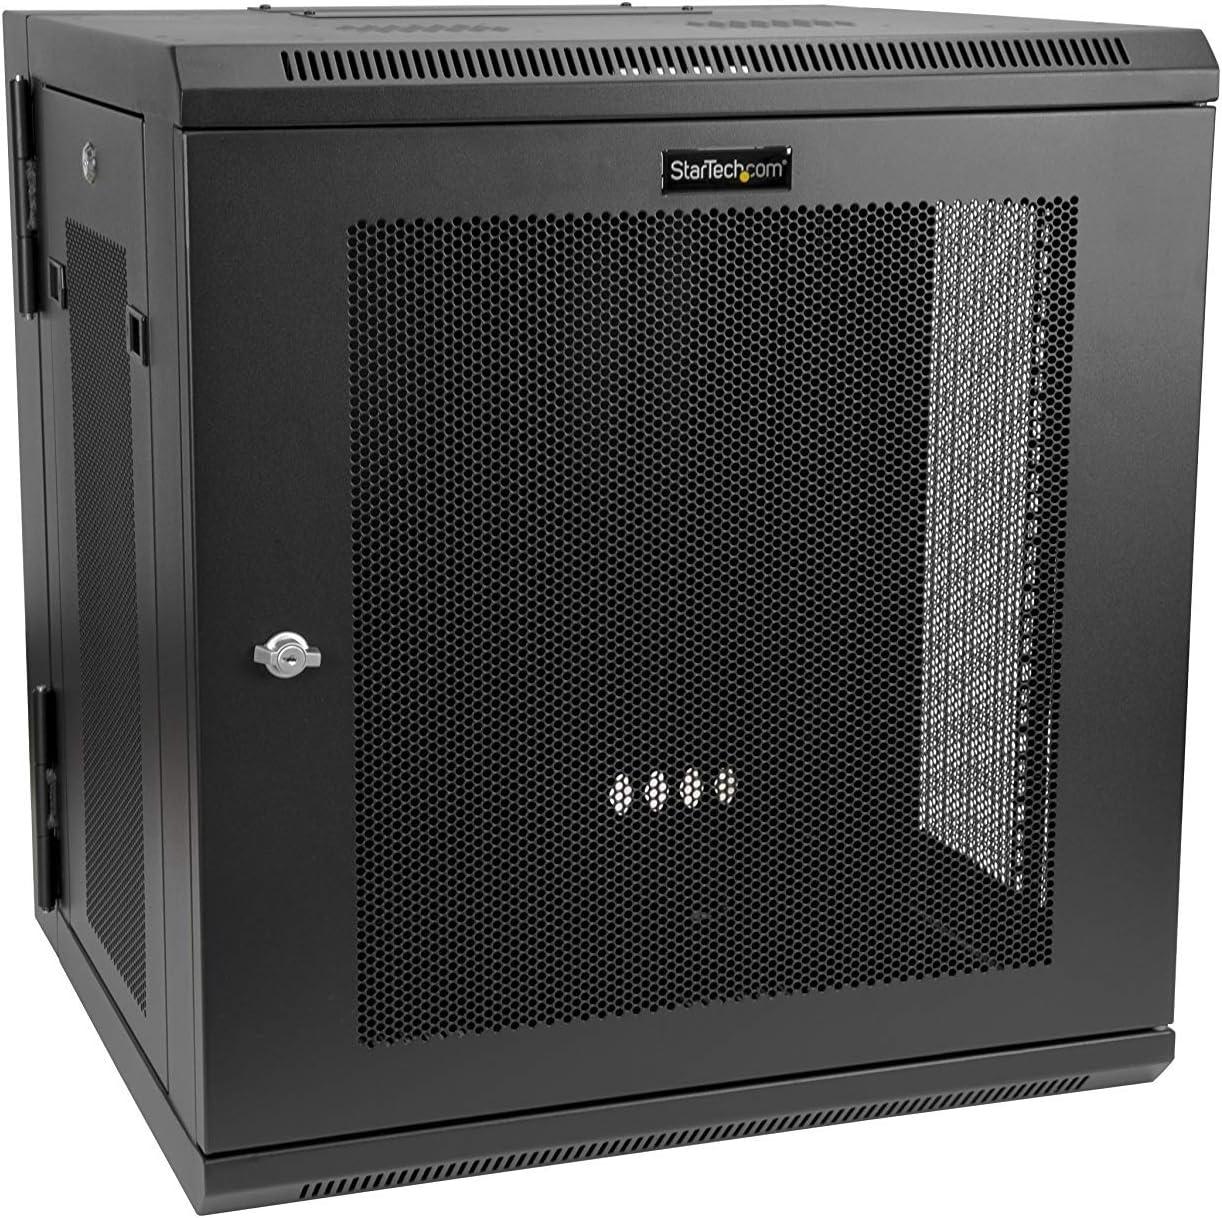 "StarTech.com 12U 19"" Wall Mount Network Cabinet - 16"" Deep Hinged Locking IT Network Switch Depth Enclosure - Vented Computer Equipment Data Rack w/Shelf & Flexible Side Panels - Assembled (RK12WALHM)"